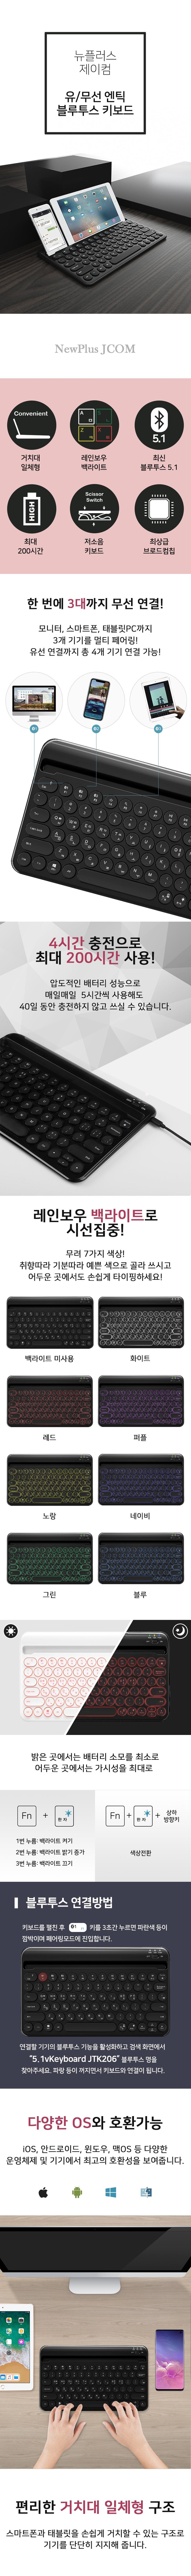 JCOM 스마트폰 블루투스키보드 핸드폰 태블릿 PC - 갓샵, 59,900원, 키보드, 무선키보드